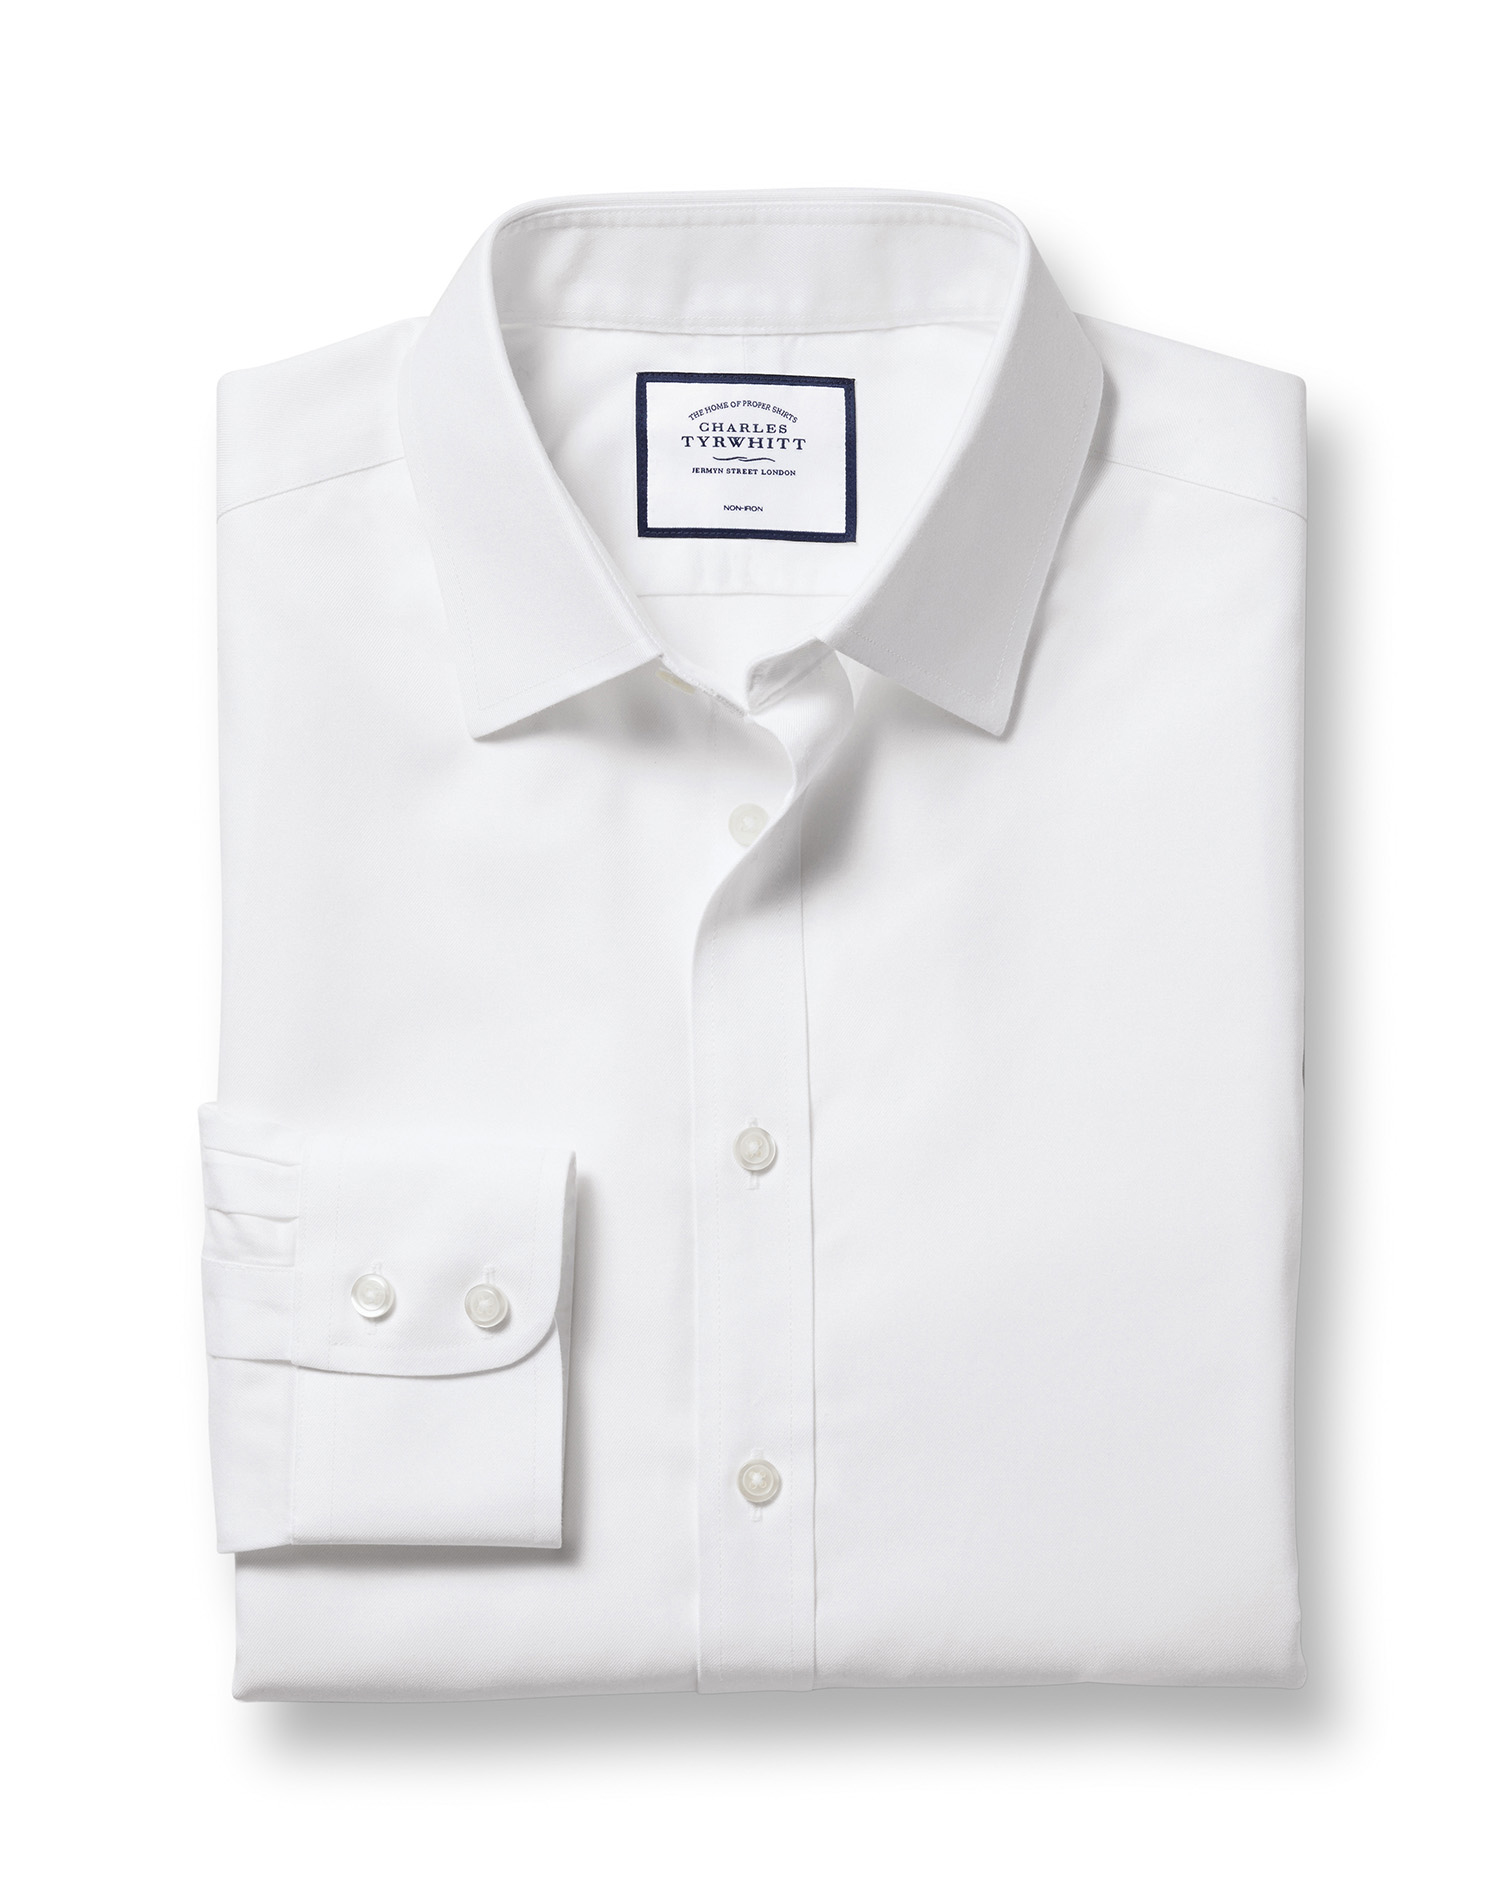 Cotton Classic Fit White Non-Iron Twill Shirt